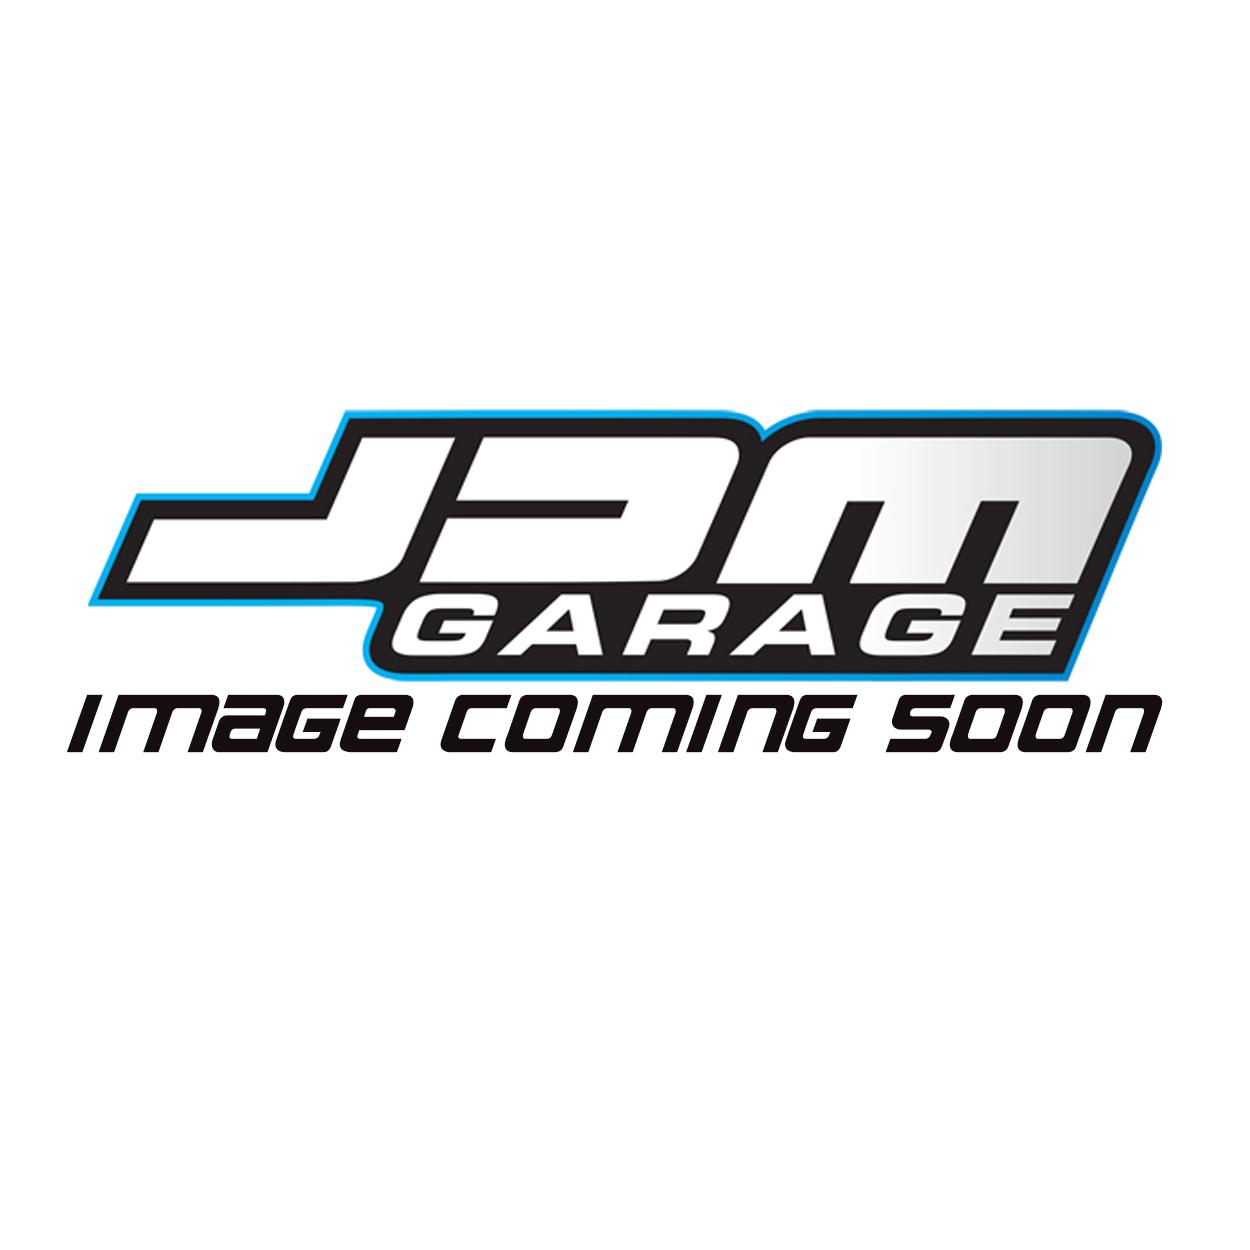 Rear Toyota Emblem Badge Fits Toyota Supra MK4 JZA80 75471-14010